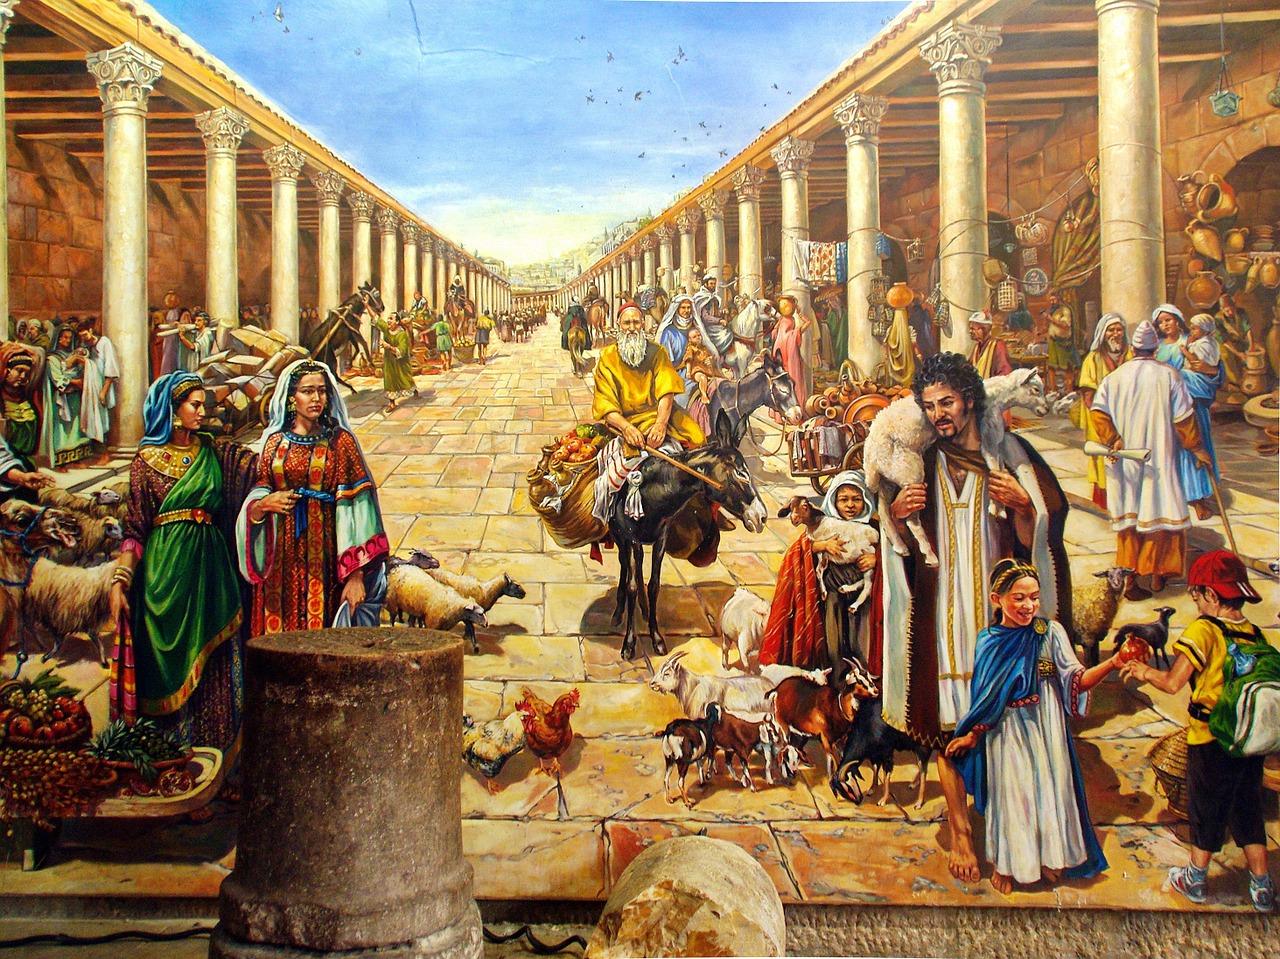 jerusalem-1221599_1280.jpg